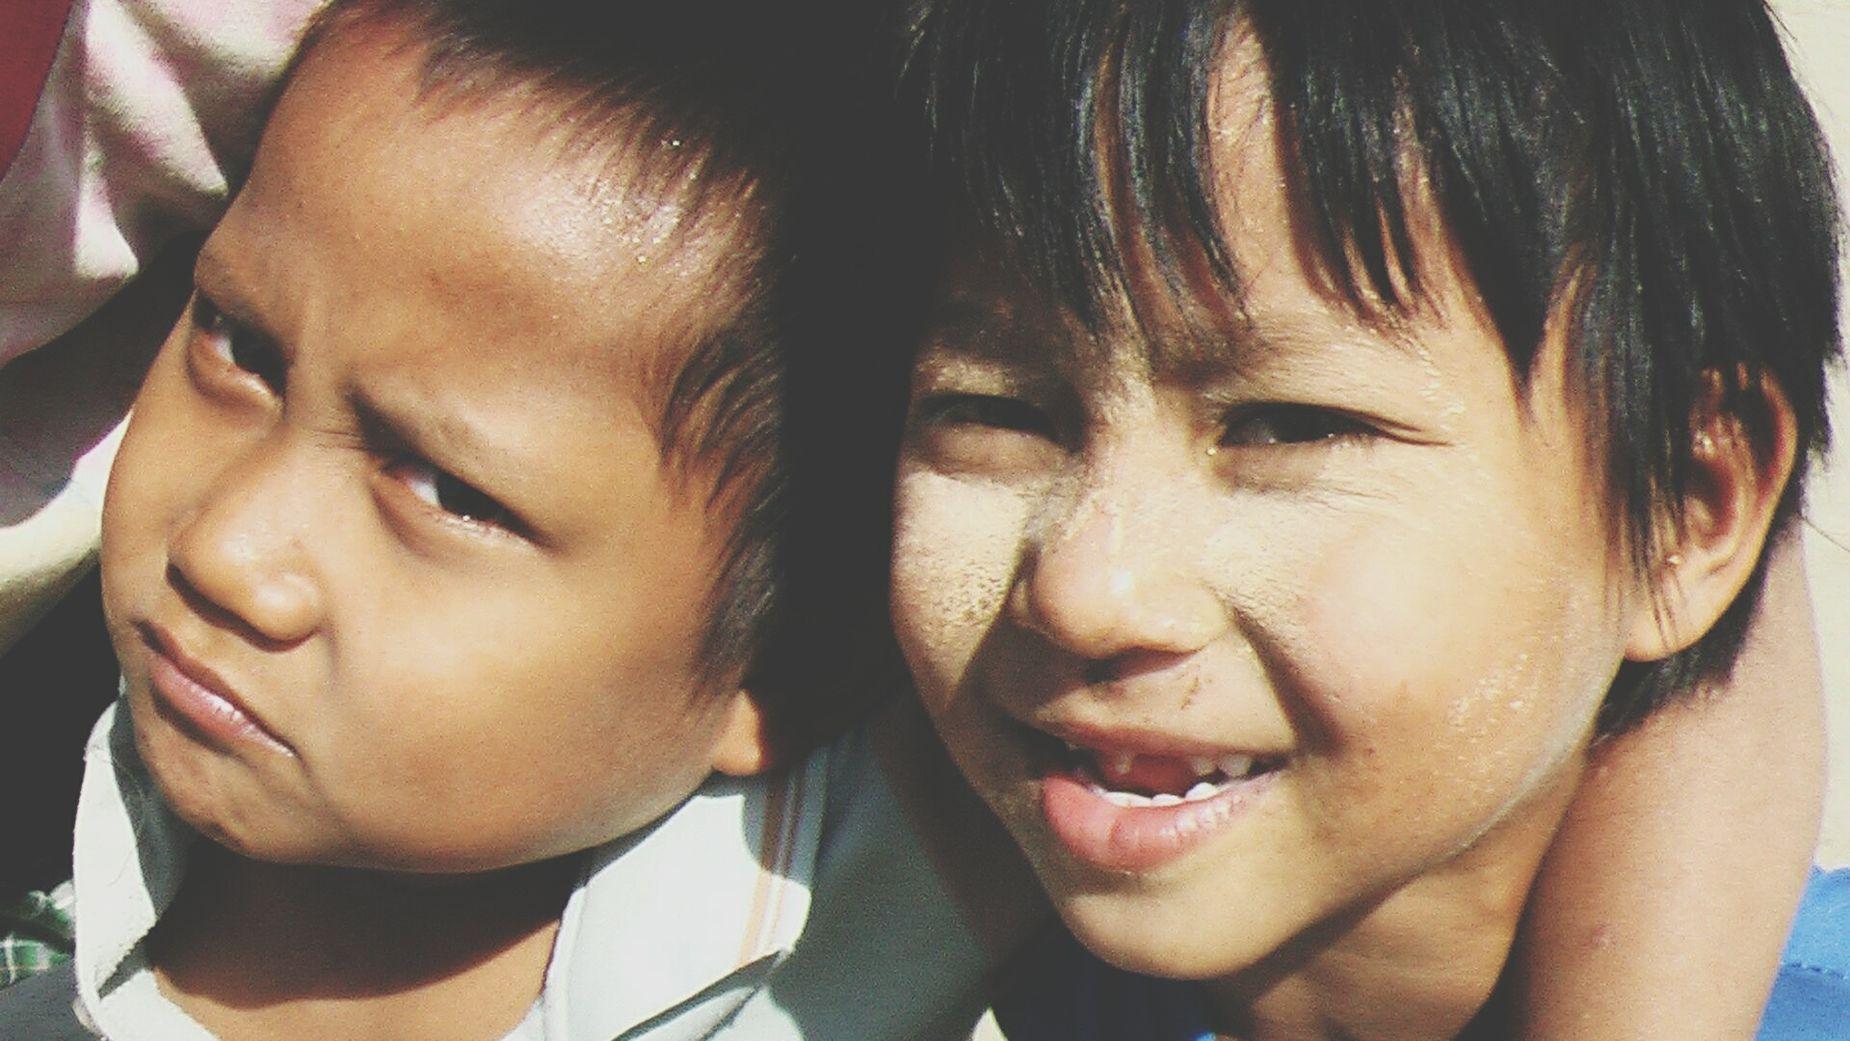 Myanmar Myanmar Kids Kids ASIA Asian World The Portraitist - 2015 EyeEm Awards Portrait Smile Boys And Girls Faces